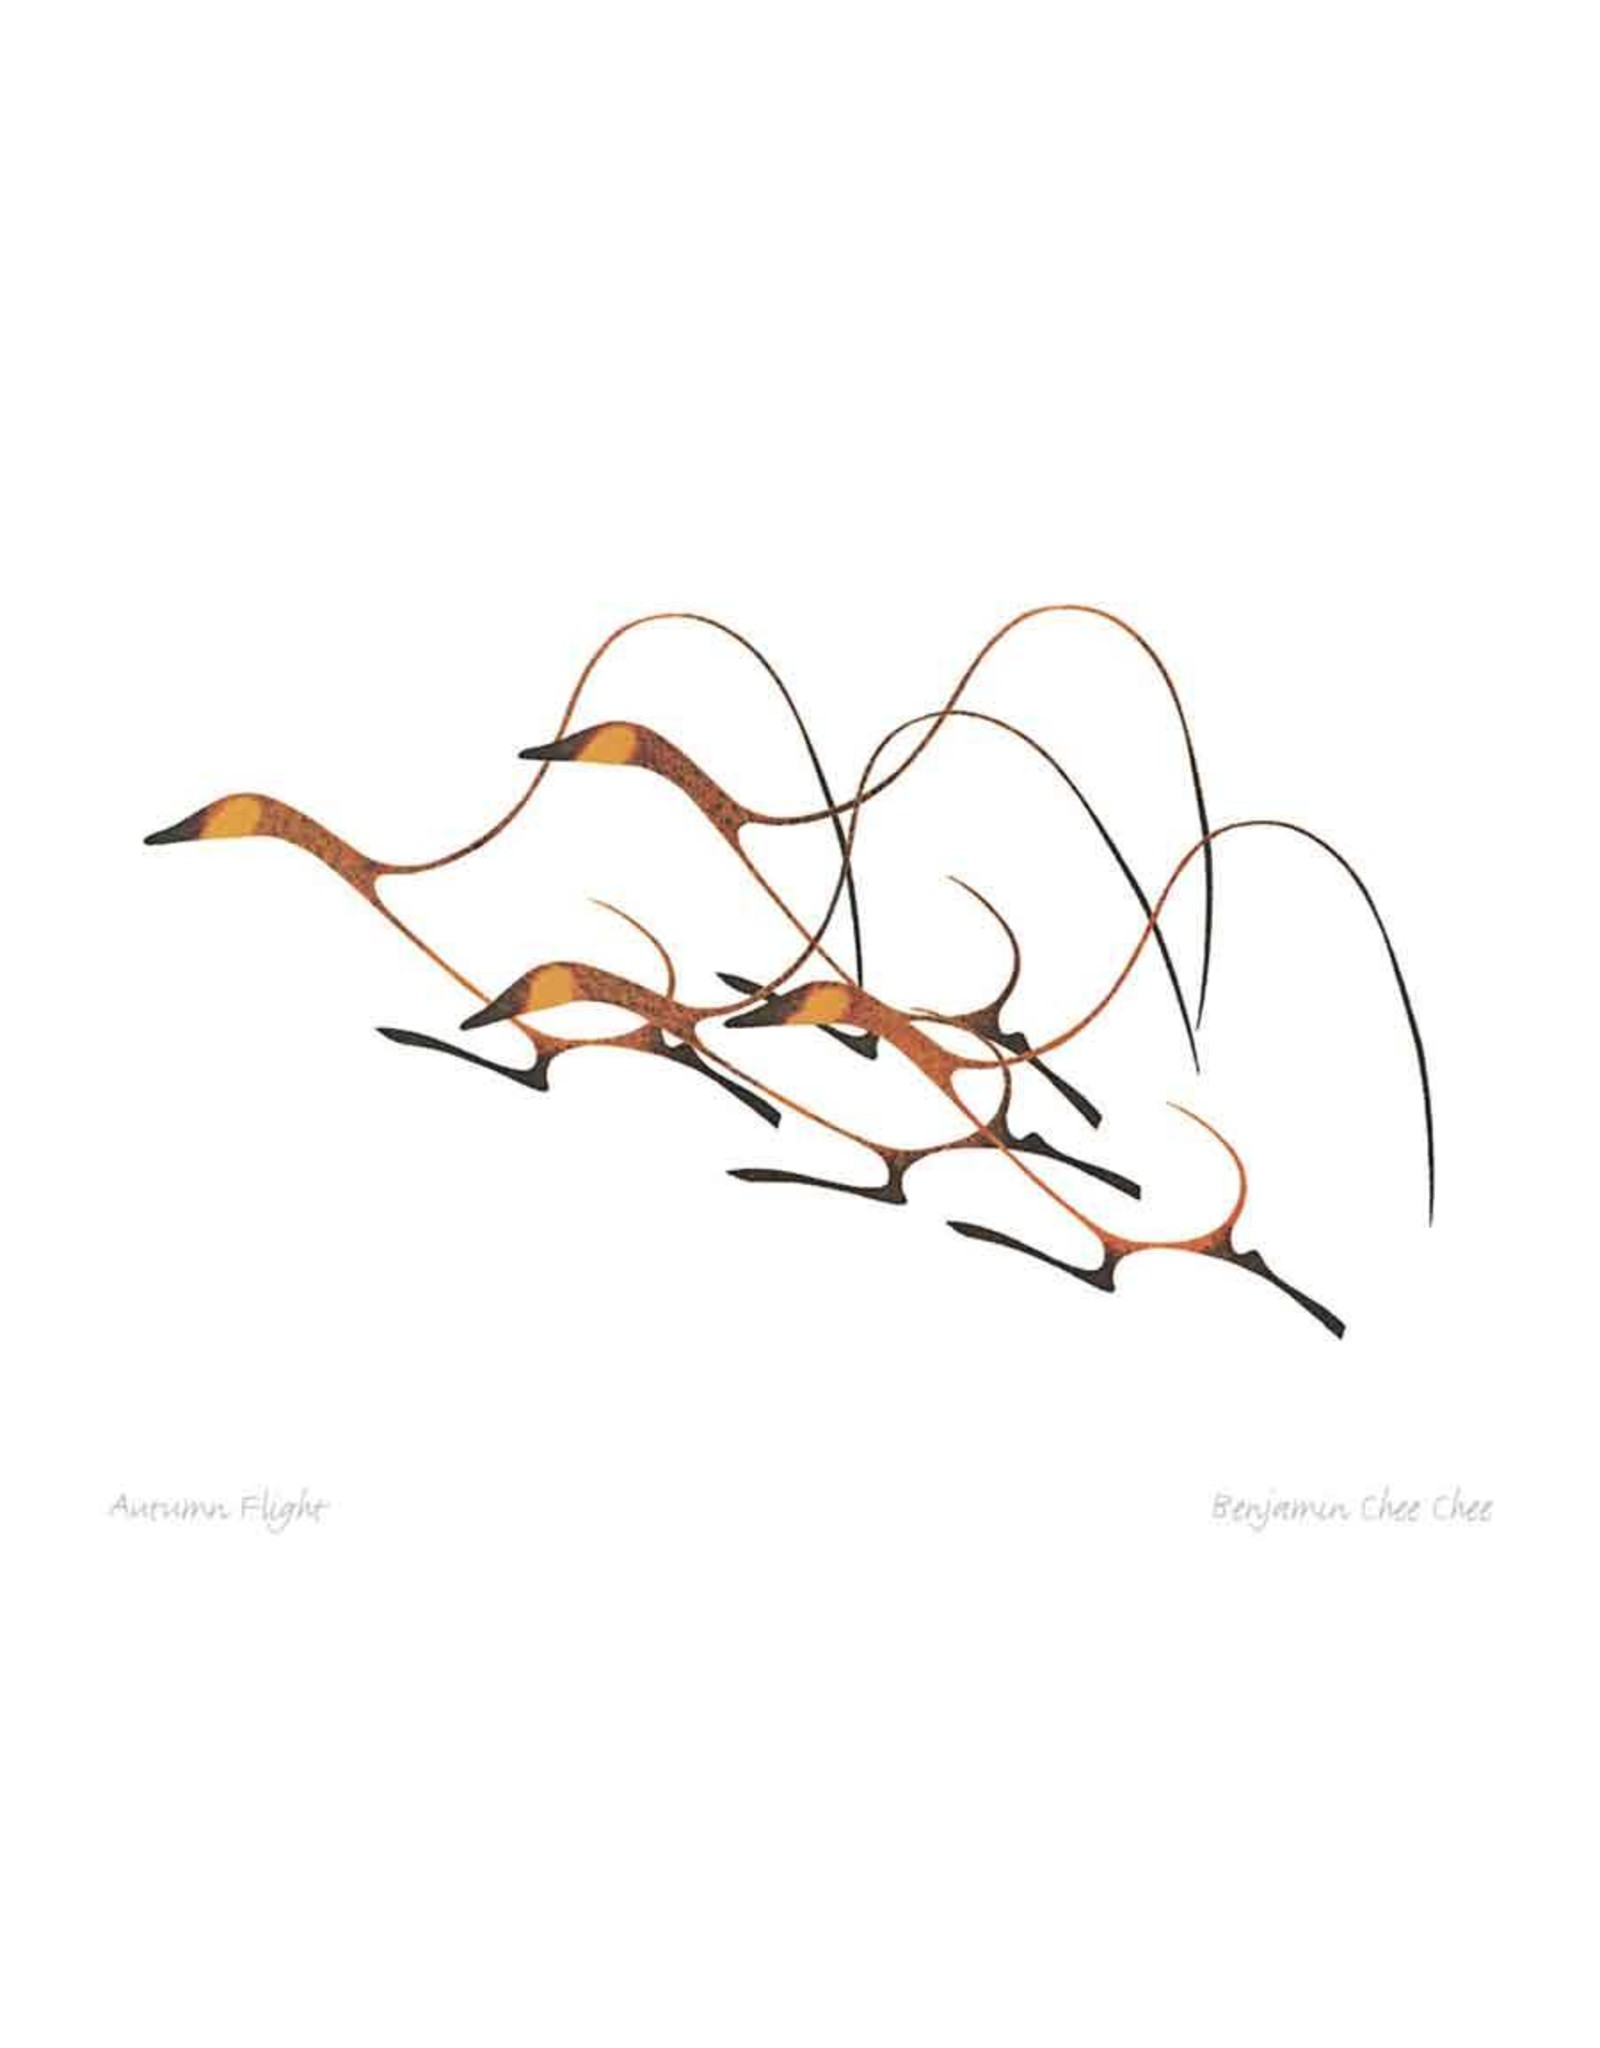 Autumn Flight by Benjamin Chee Chee Matted